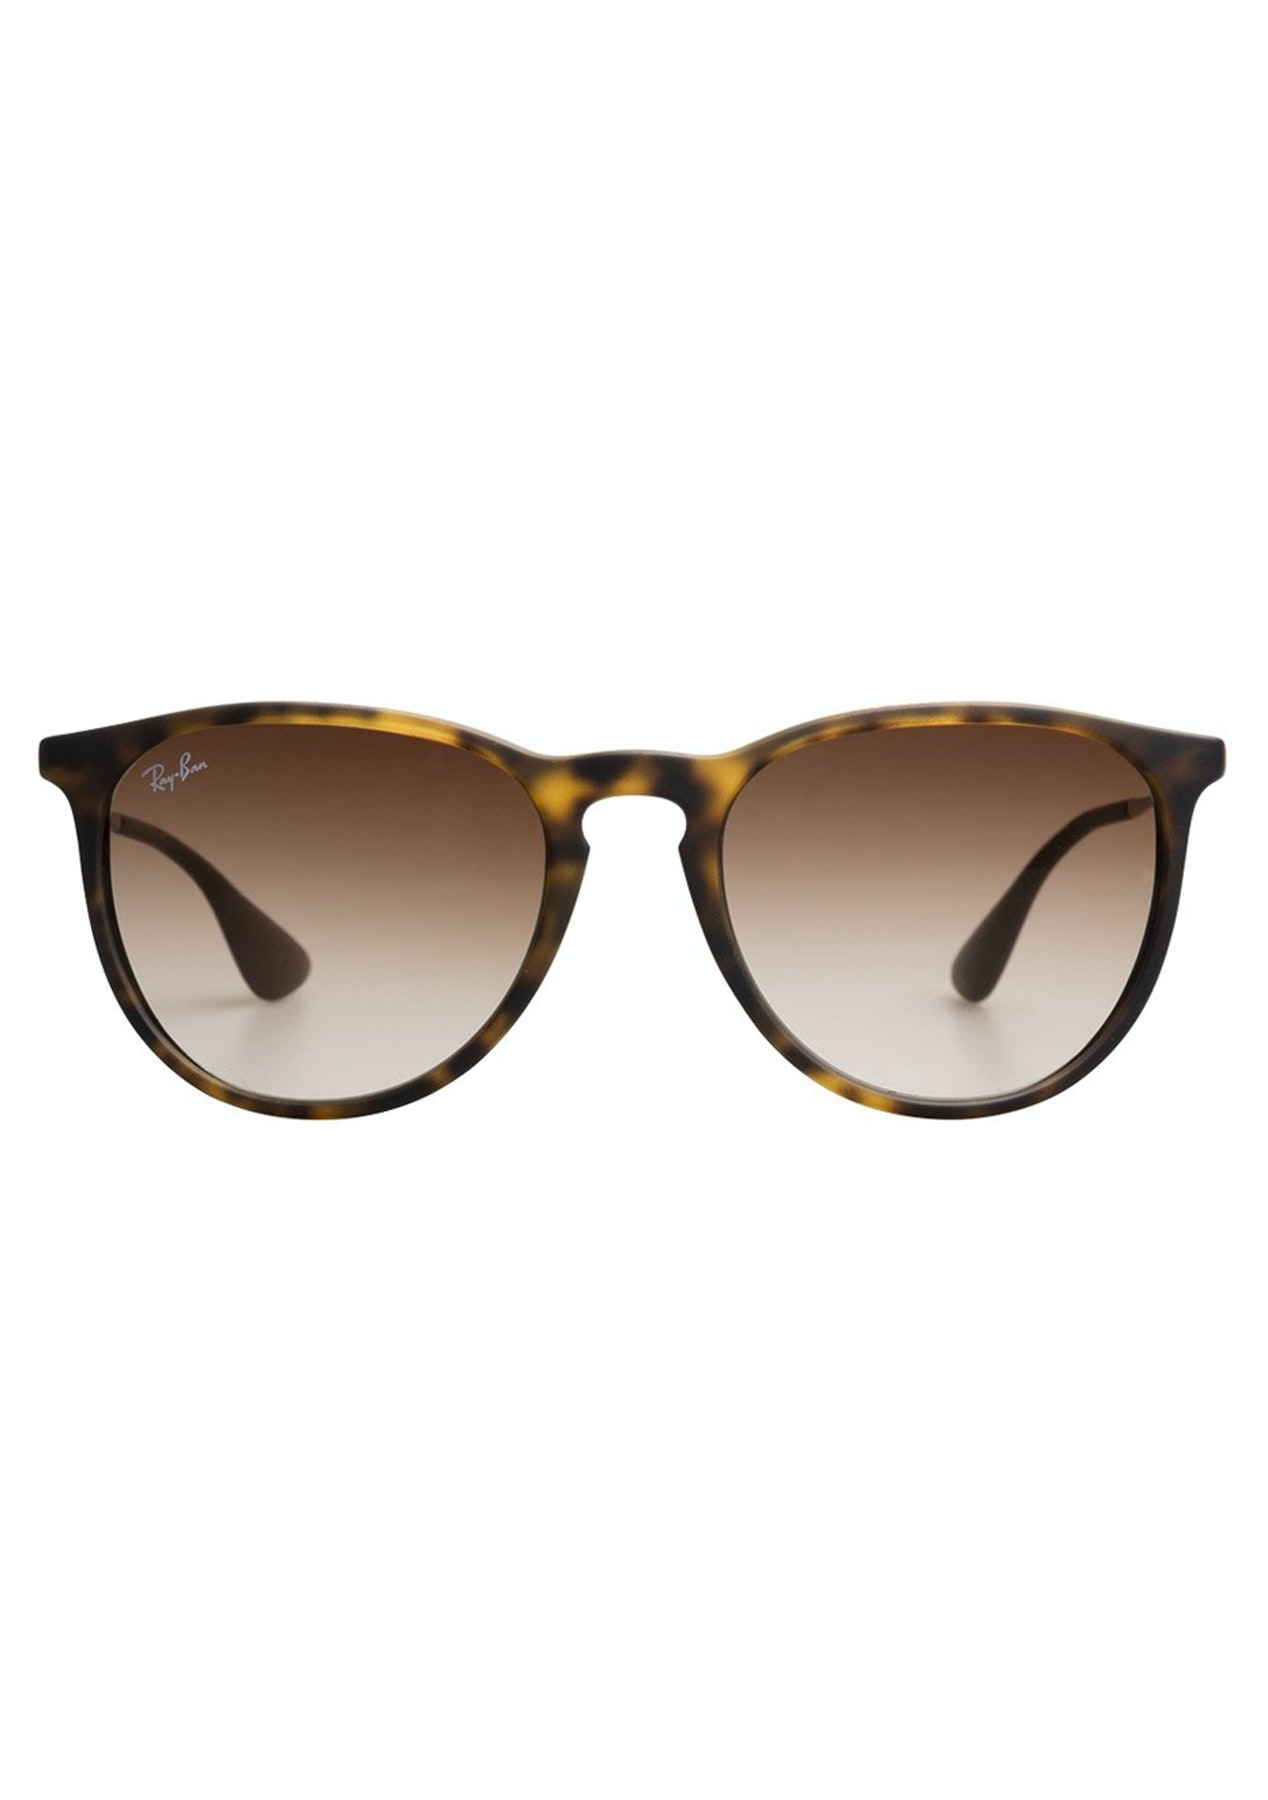 cd70e31a3c Ray-Ban - RB4171 865/13/54 - Erika - Classic Brown - Big Brand Sunglasses -  Onceit